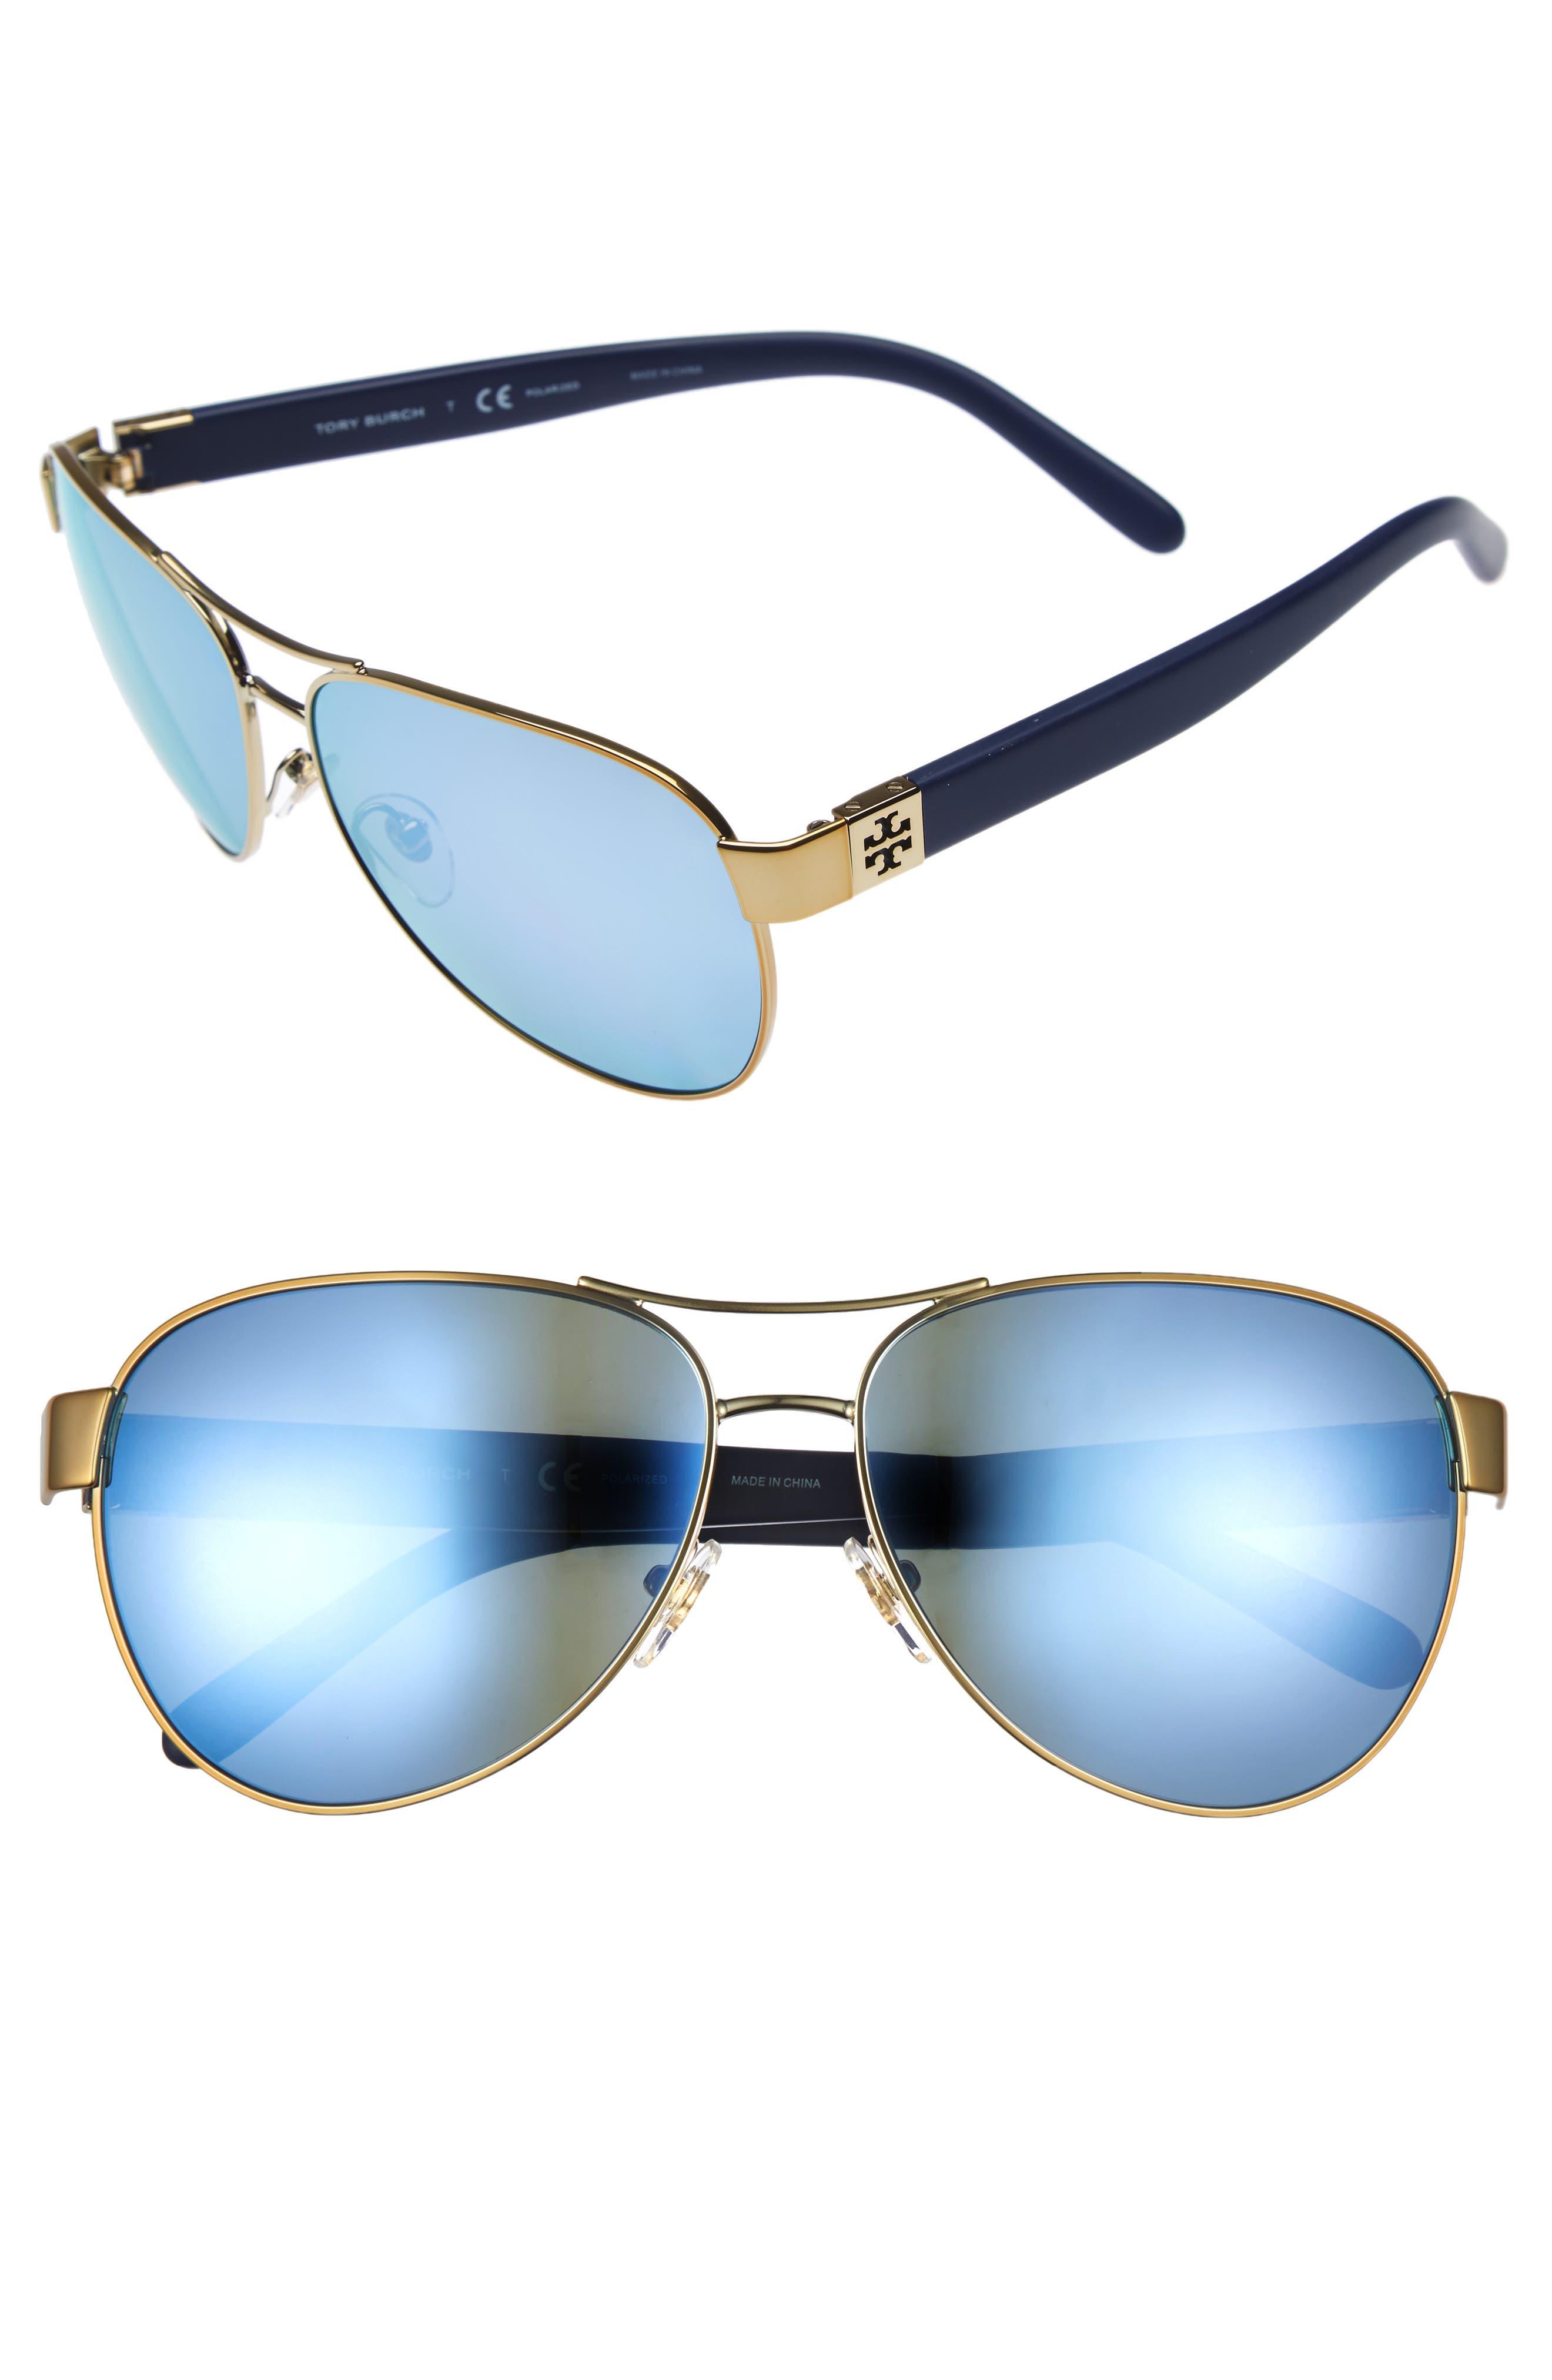 Tory Burch 60mm Polarized Aviator Sunglasses